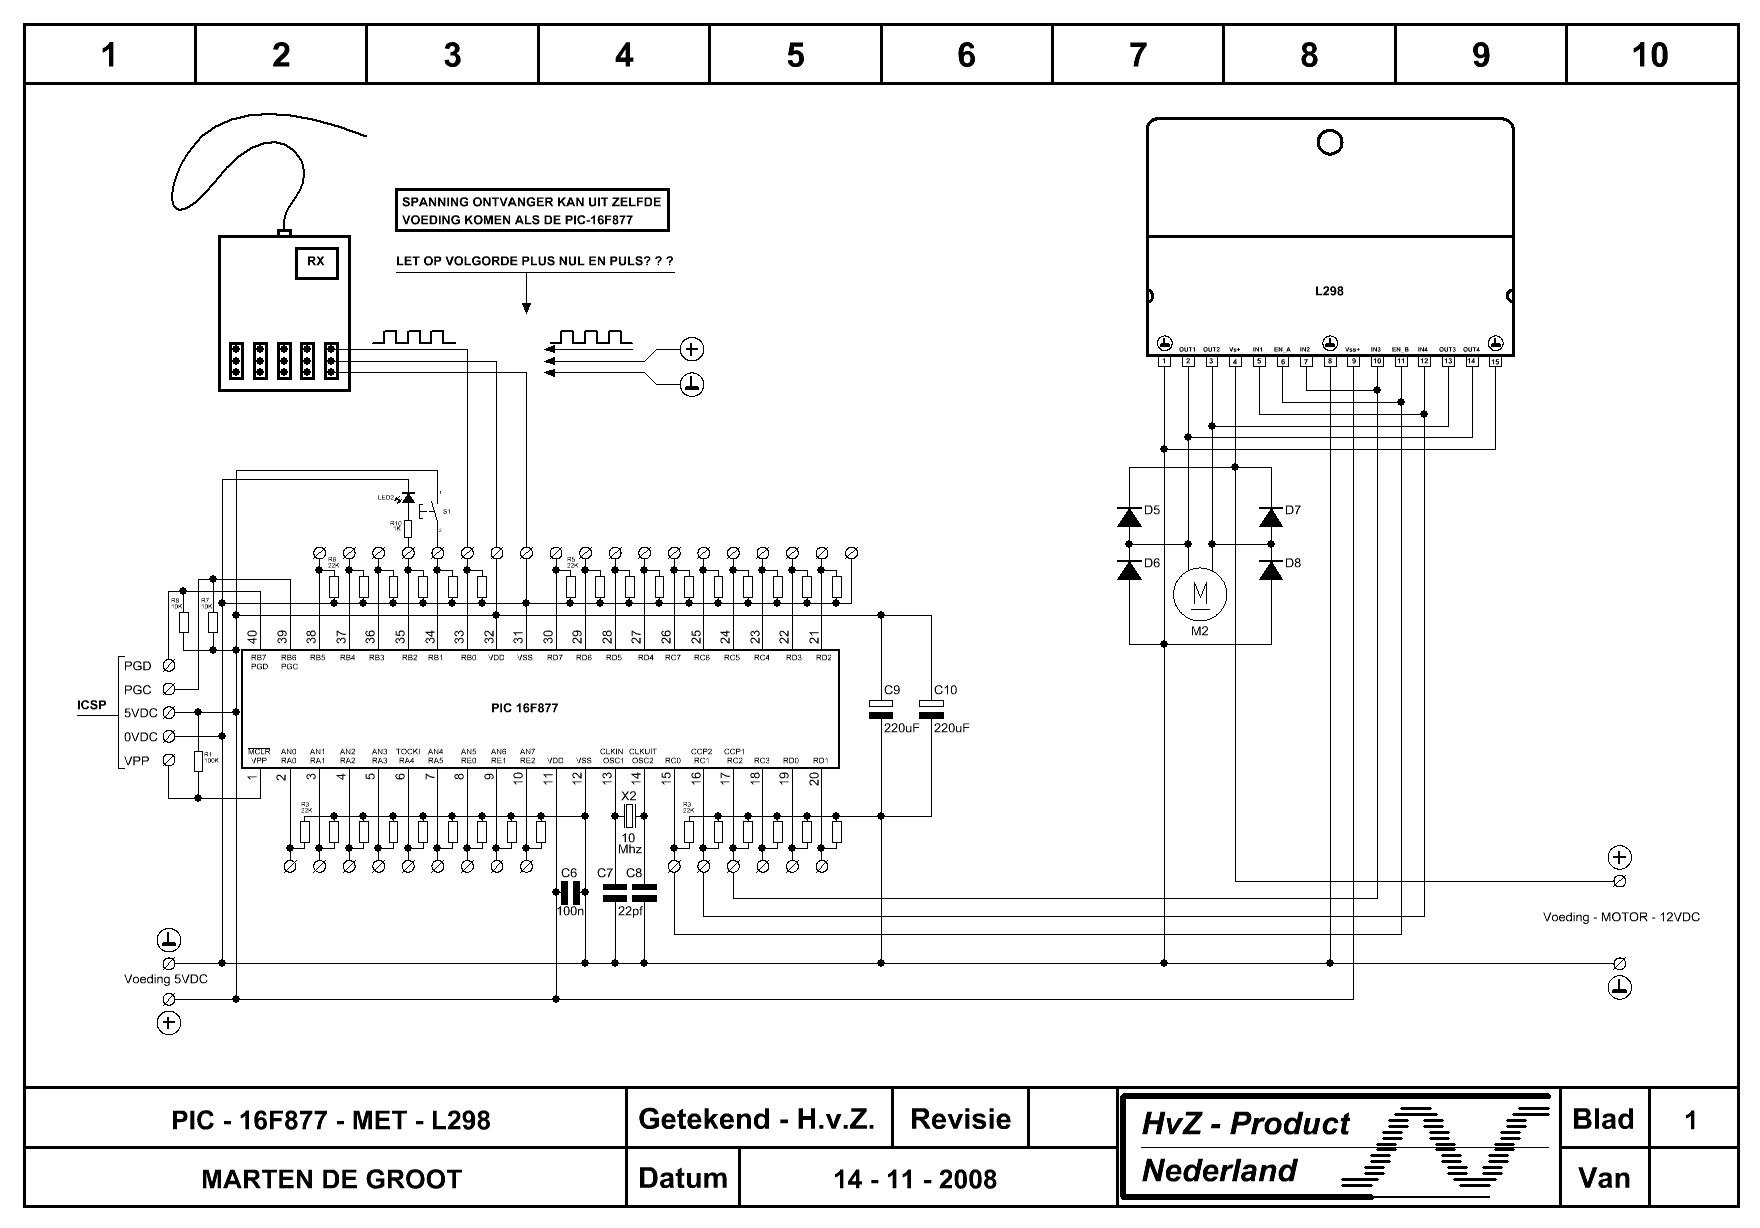 L298 Forum Circuits Online Led Circuit Calculator Http Wwwcircuitsonlinenet Download 48 Uploadarchiefnet Files Resized